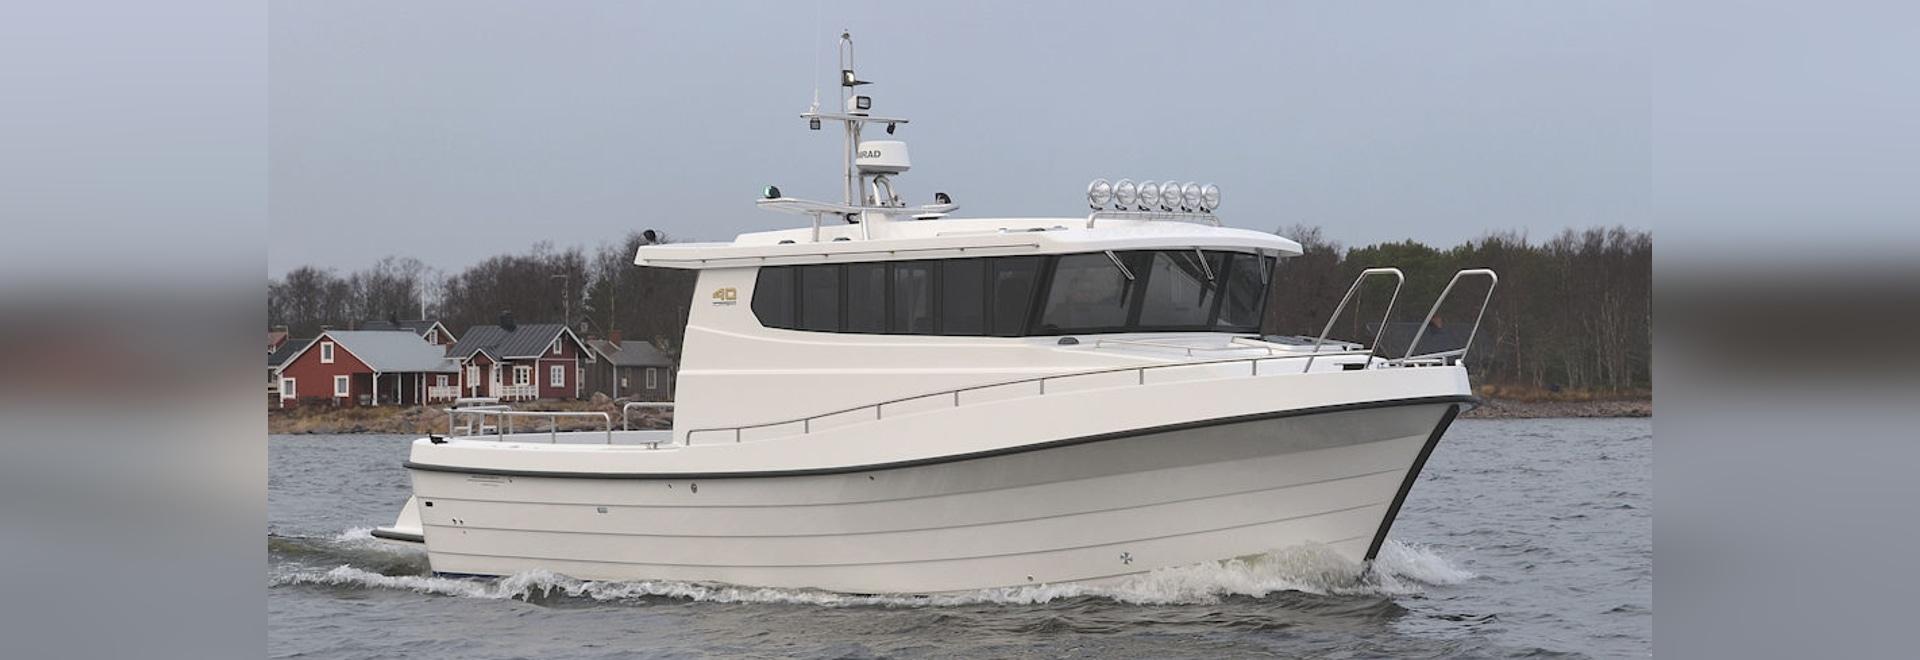 NEW: inboard multi-purpose work boat by Kulkuri-Veneet Oy